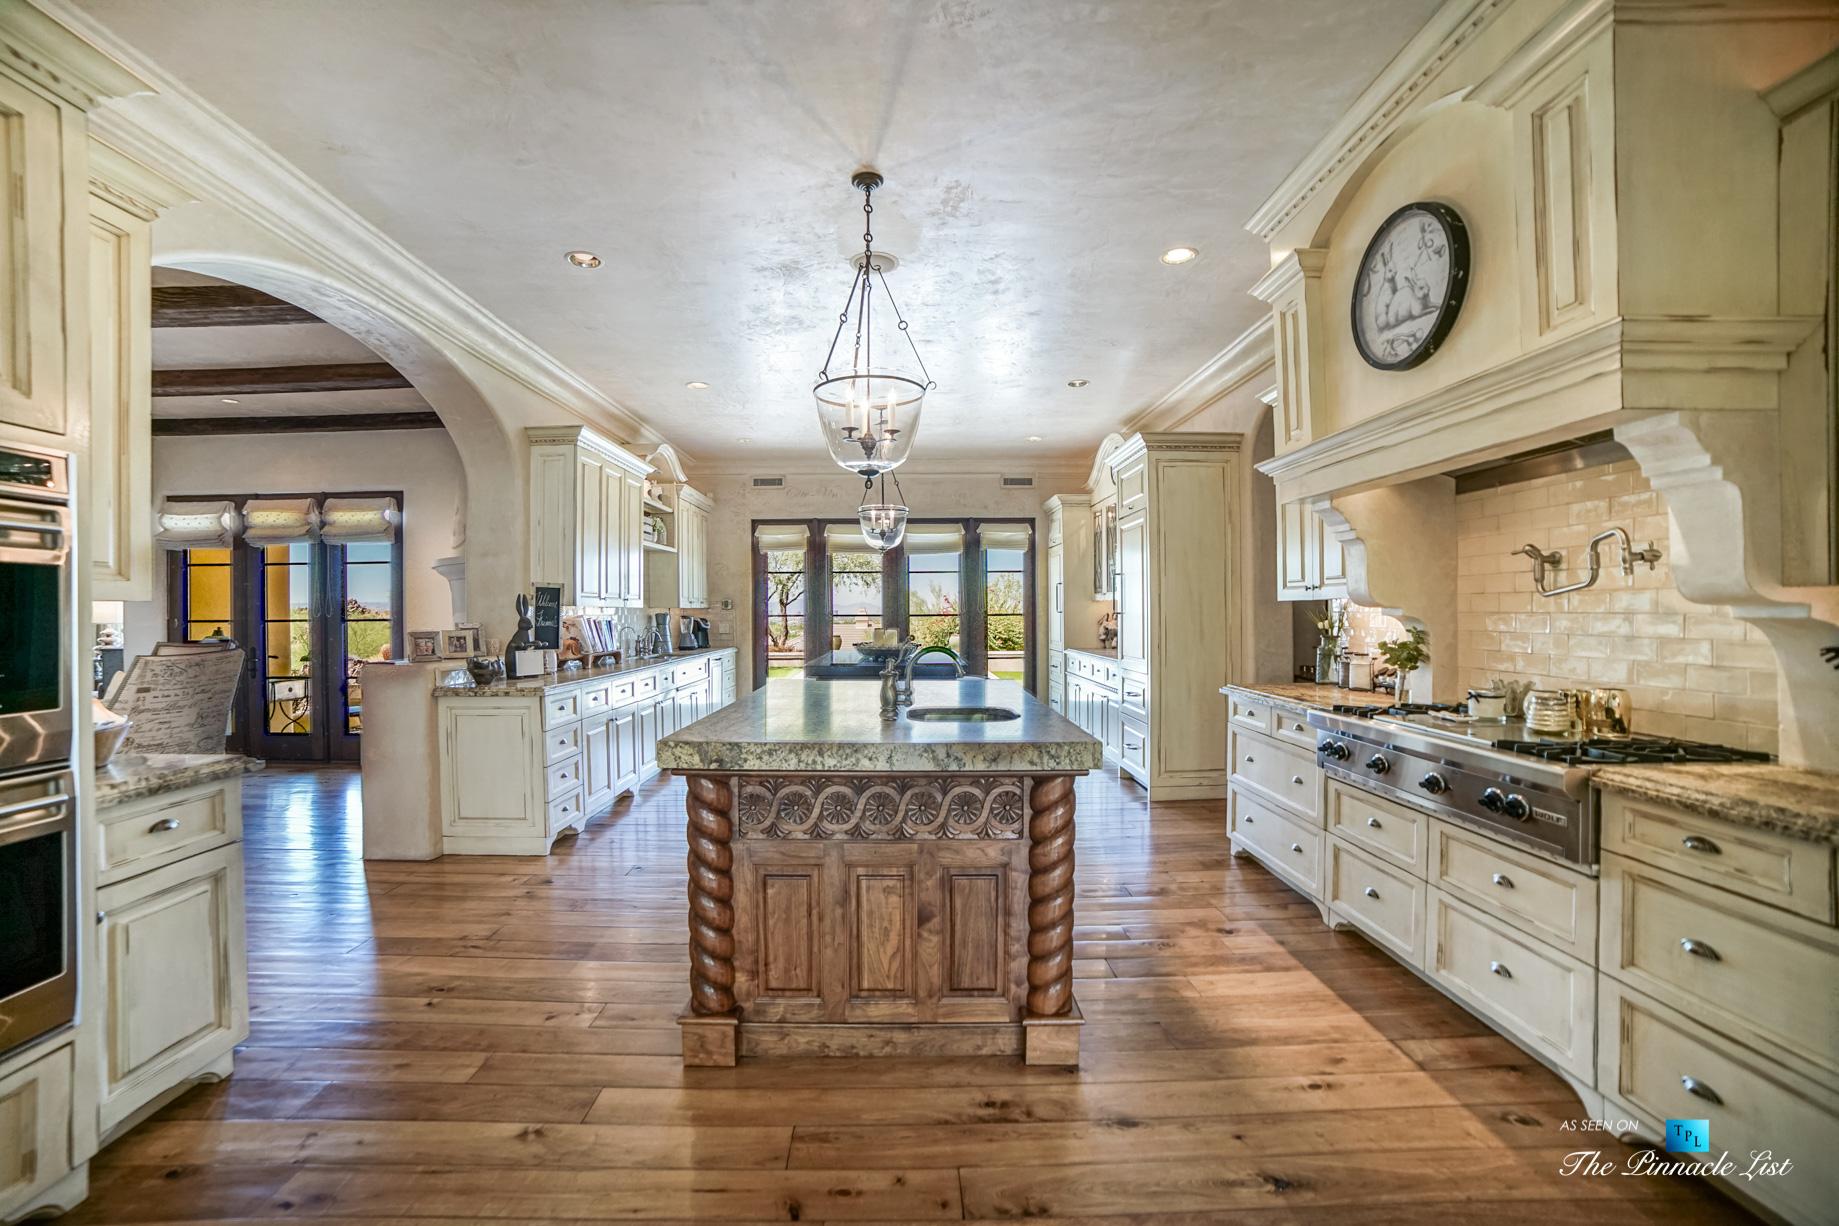 6539 N 31st Pl, Phoenix, AZ, USA - Kitchen - Luxury Real Estate - Biltmore Mountain Estates - Spanish Colonial Home